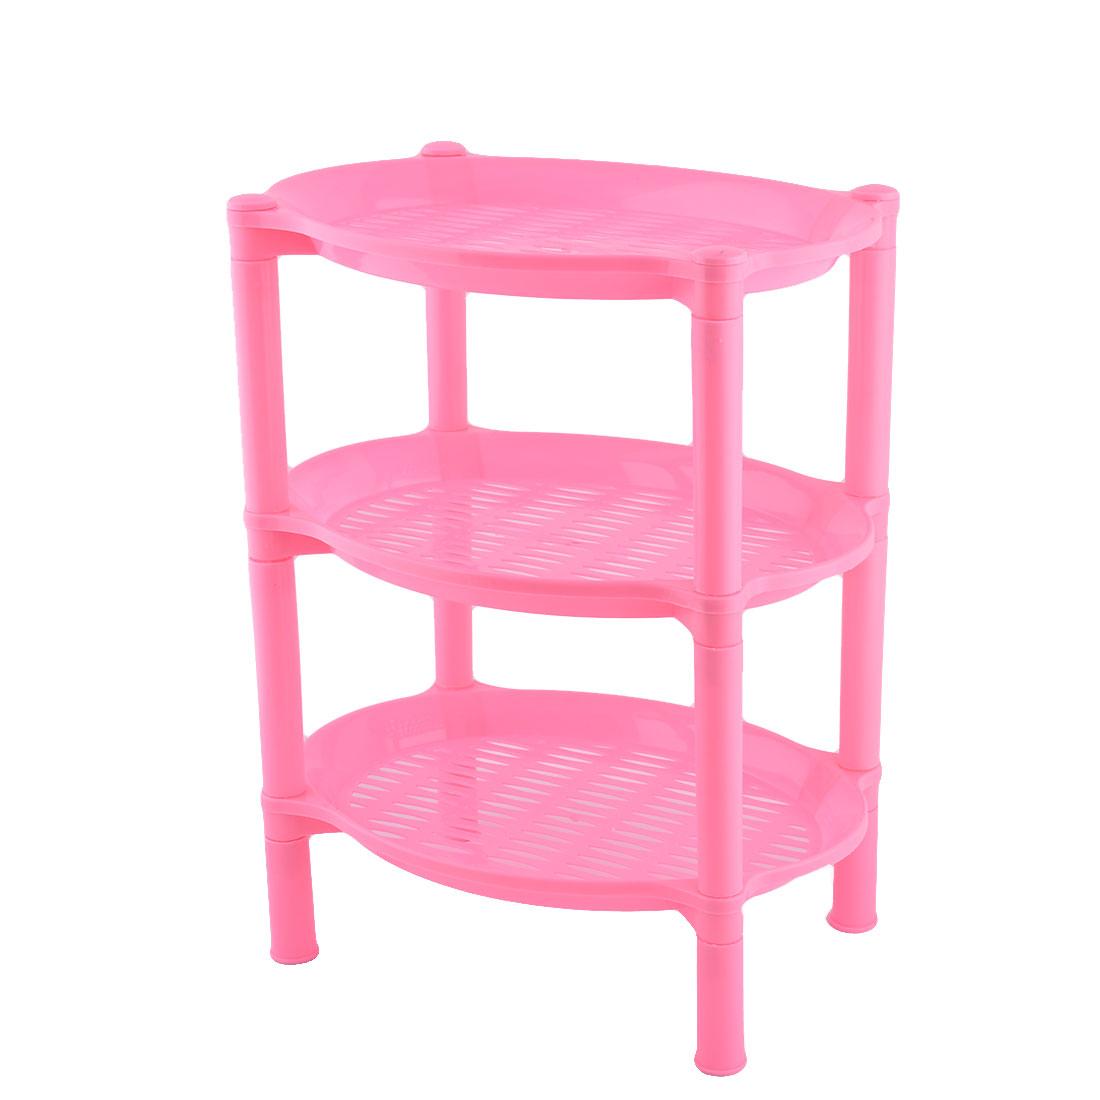 Household Bathroom Plastic Mini 3 Layer Shelf Storage Rack Organizer Pink